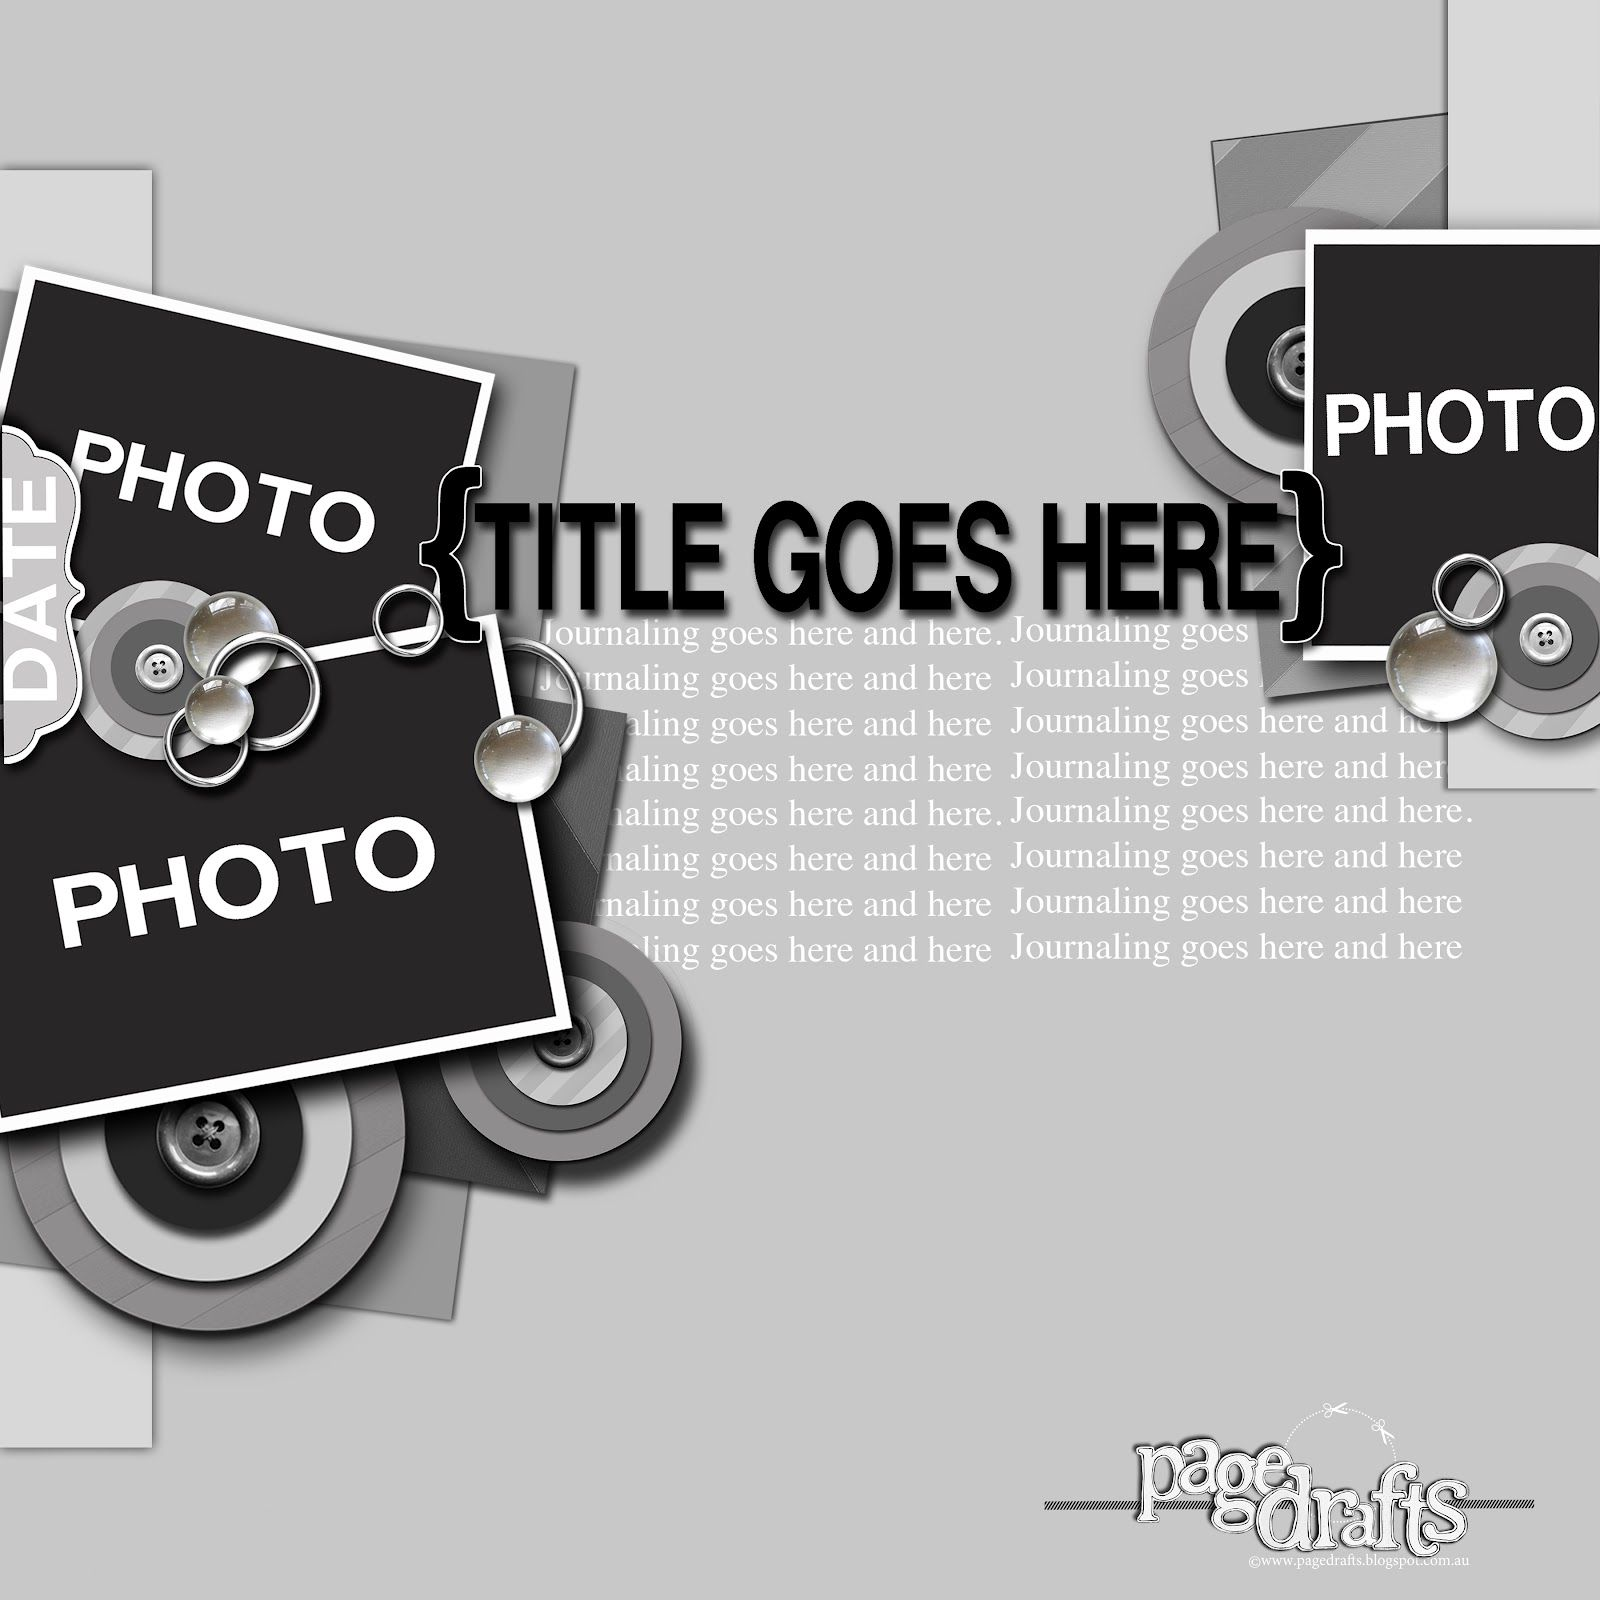 Page Drafts: 3 X PHOTOS